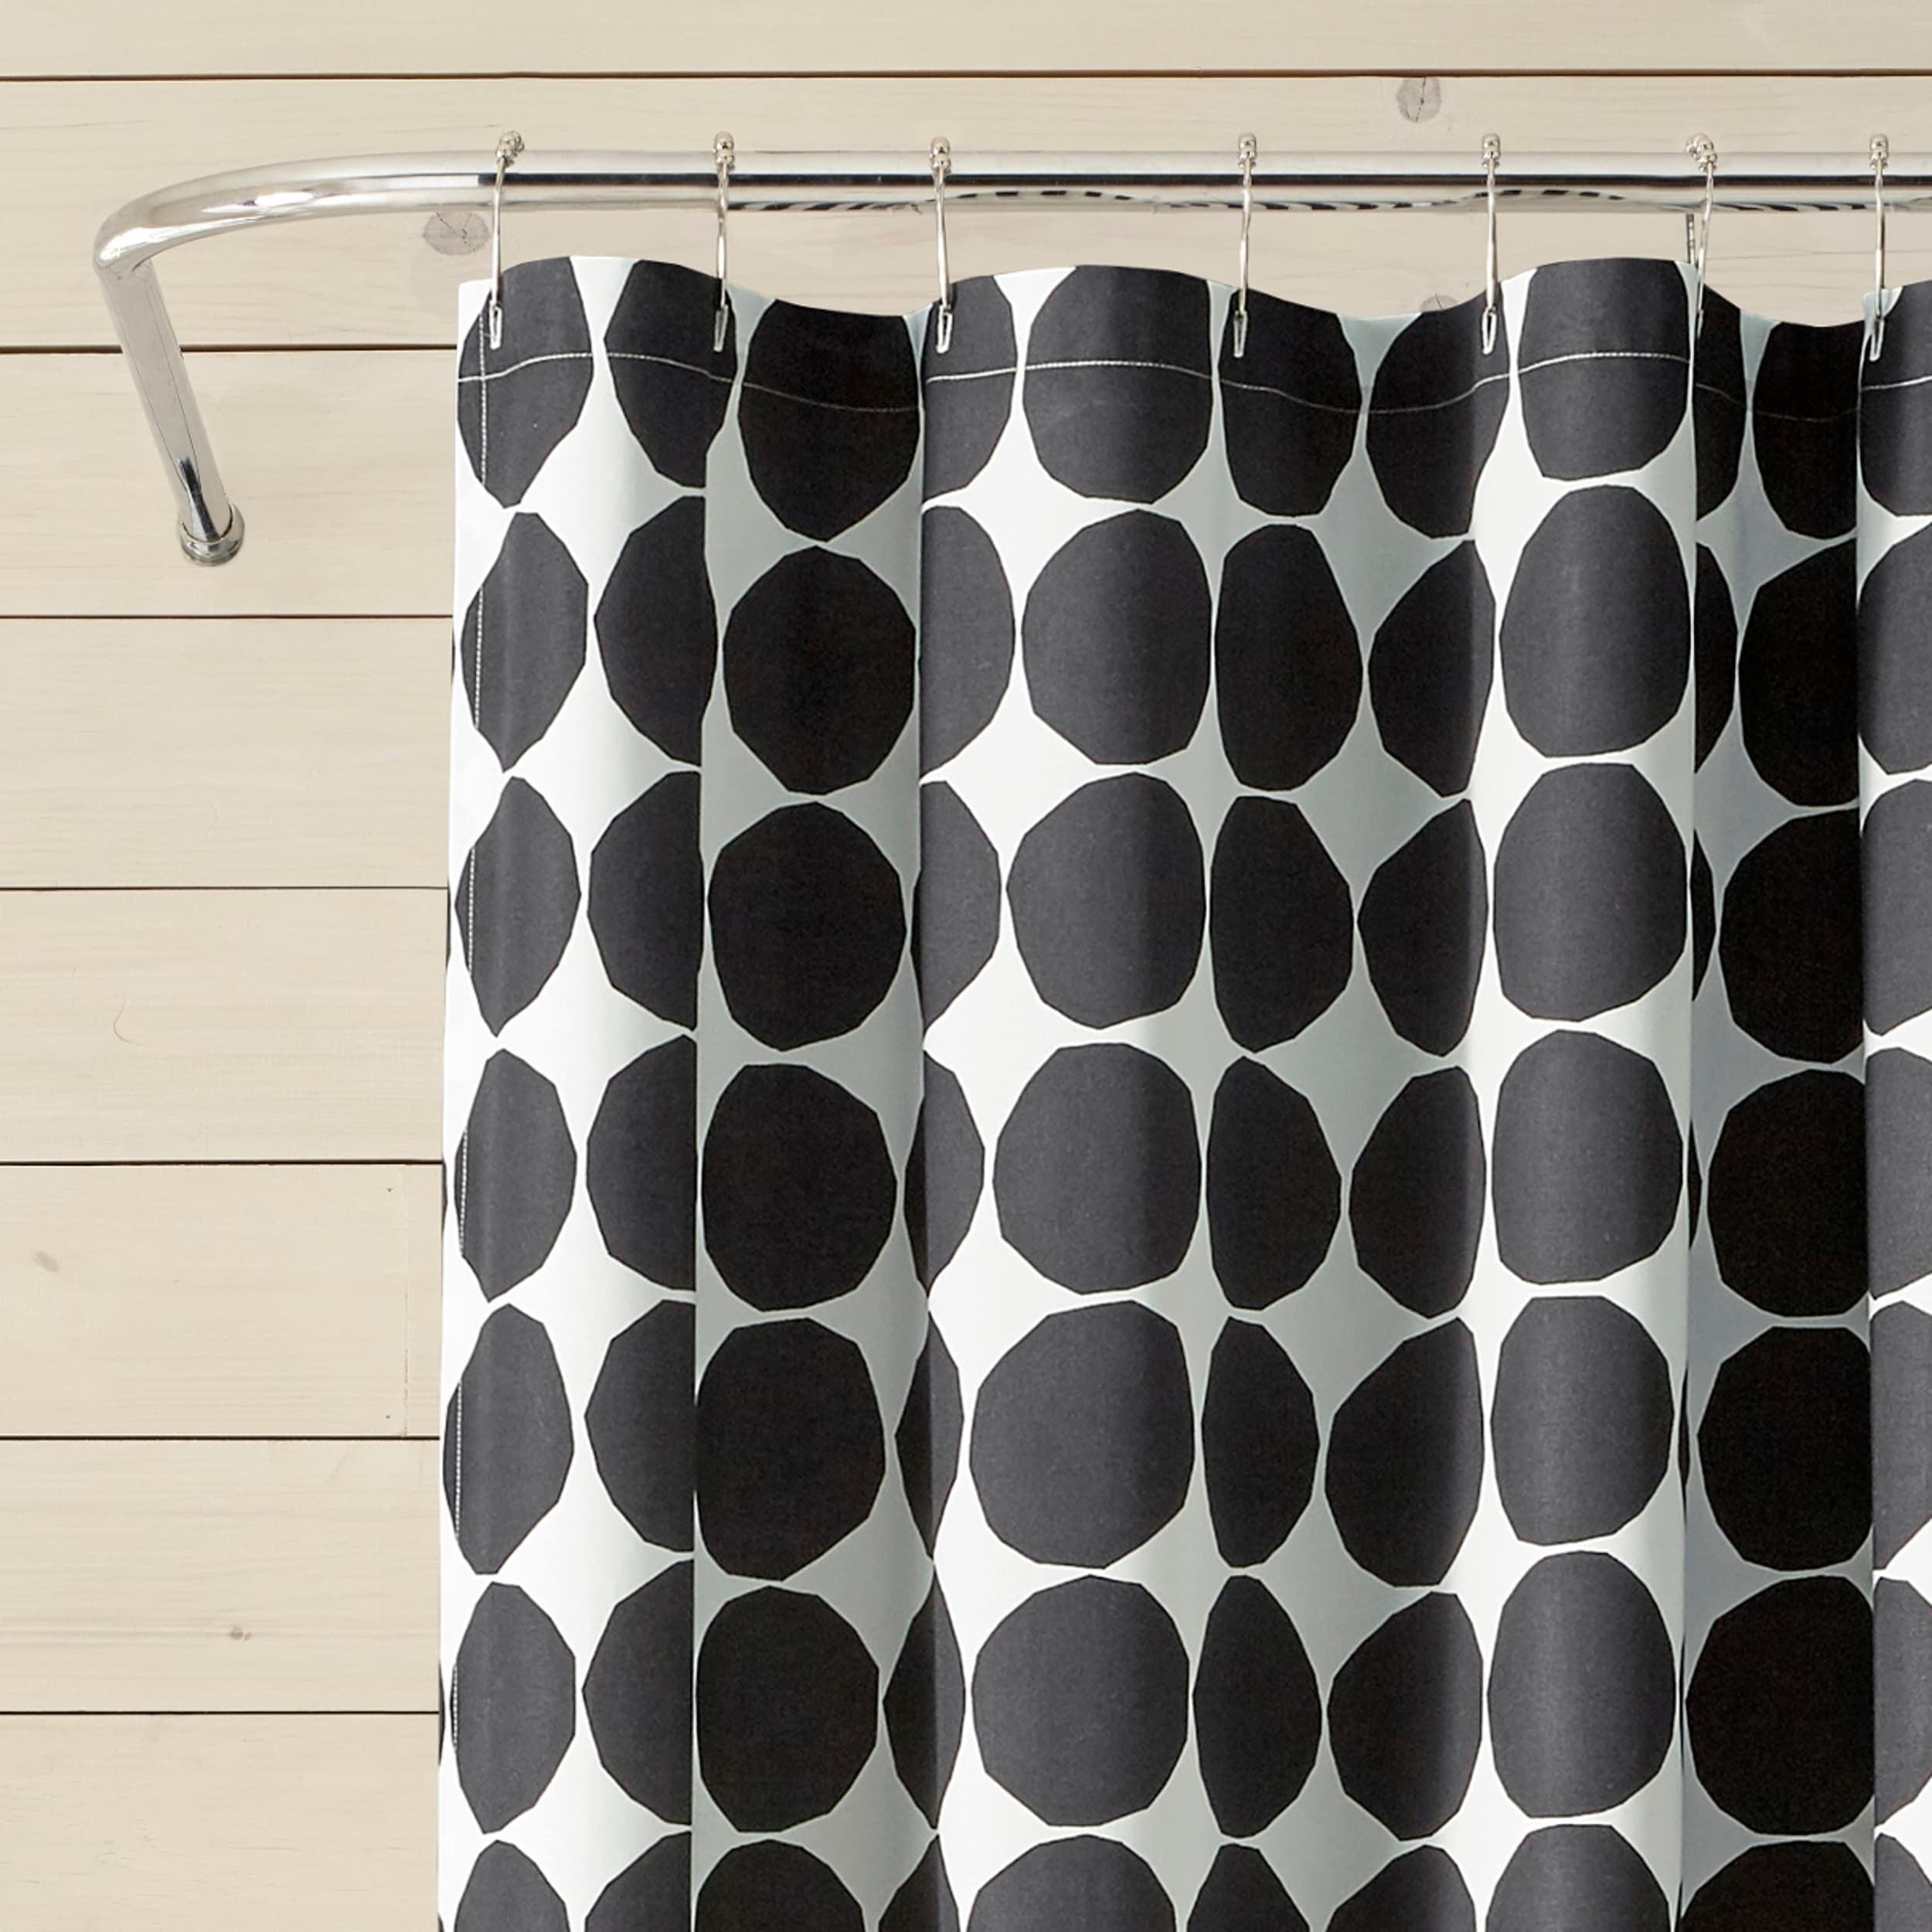 Shop Black Friday Deals On Marimekko Pienet Kivet White Shower Curtain Overstock 27621393